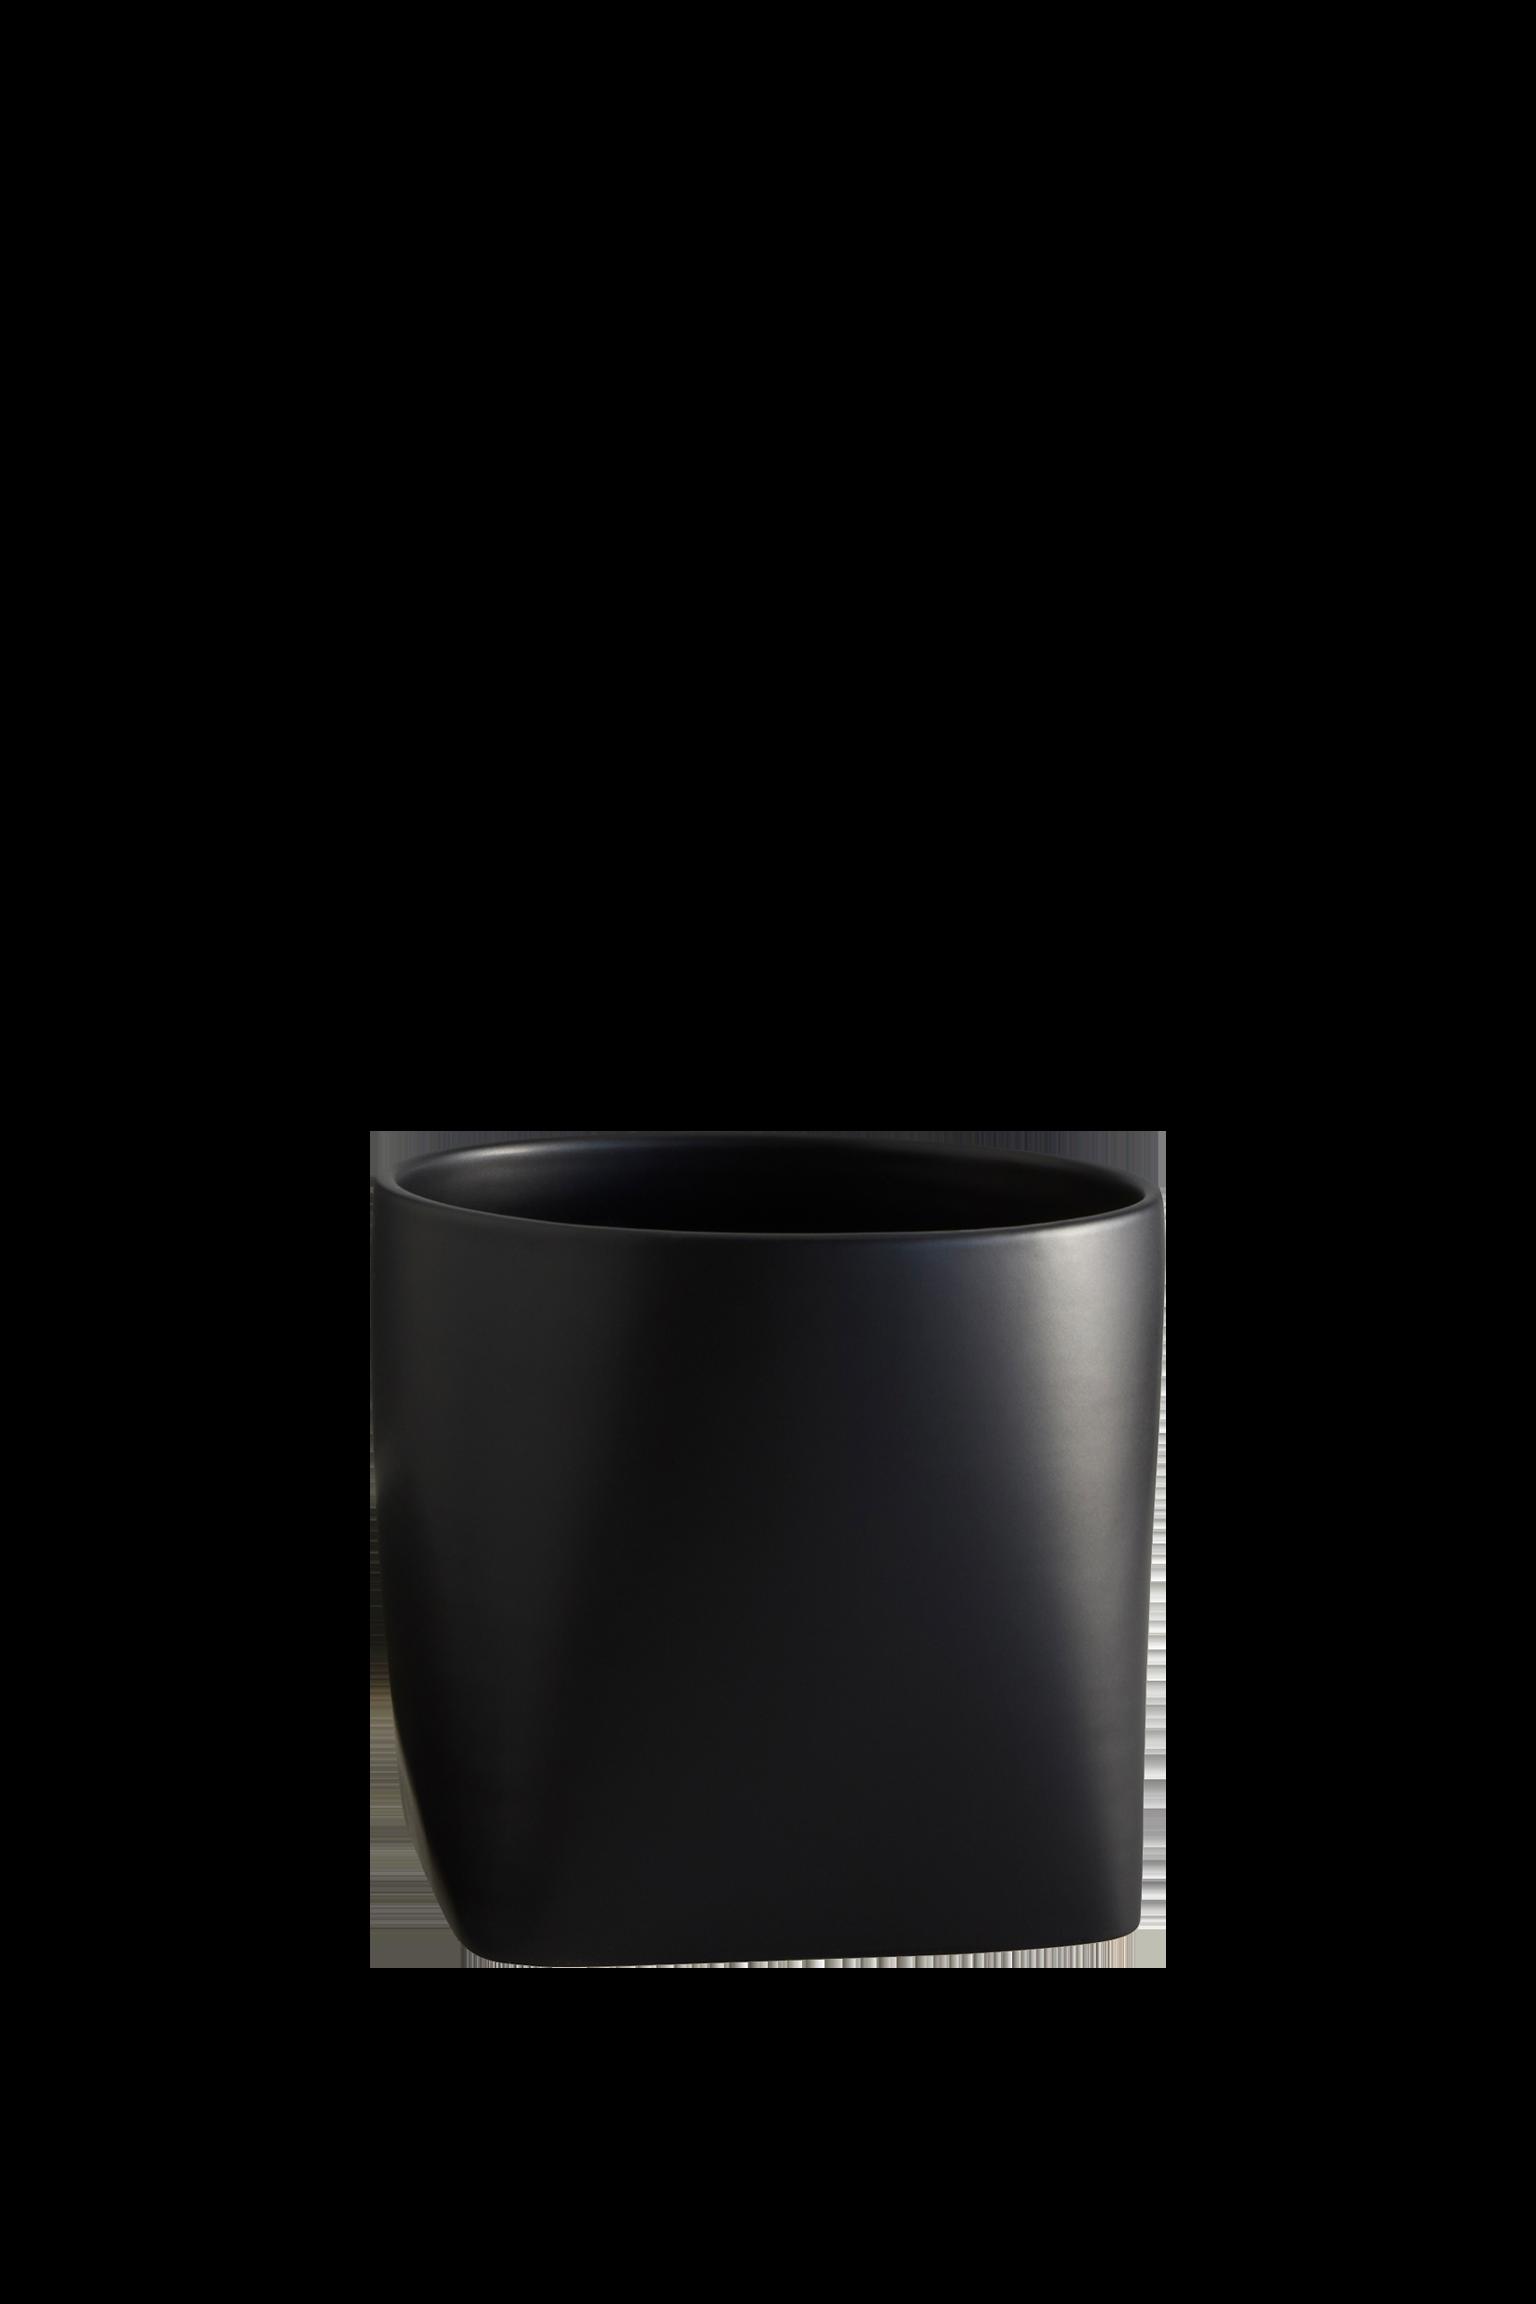 SOMMA - Pot Black 14cm